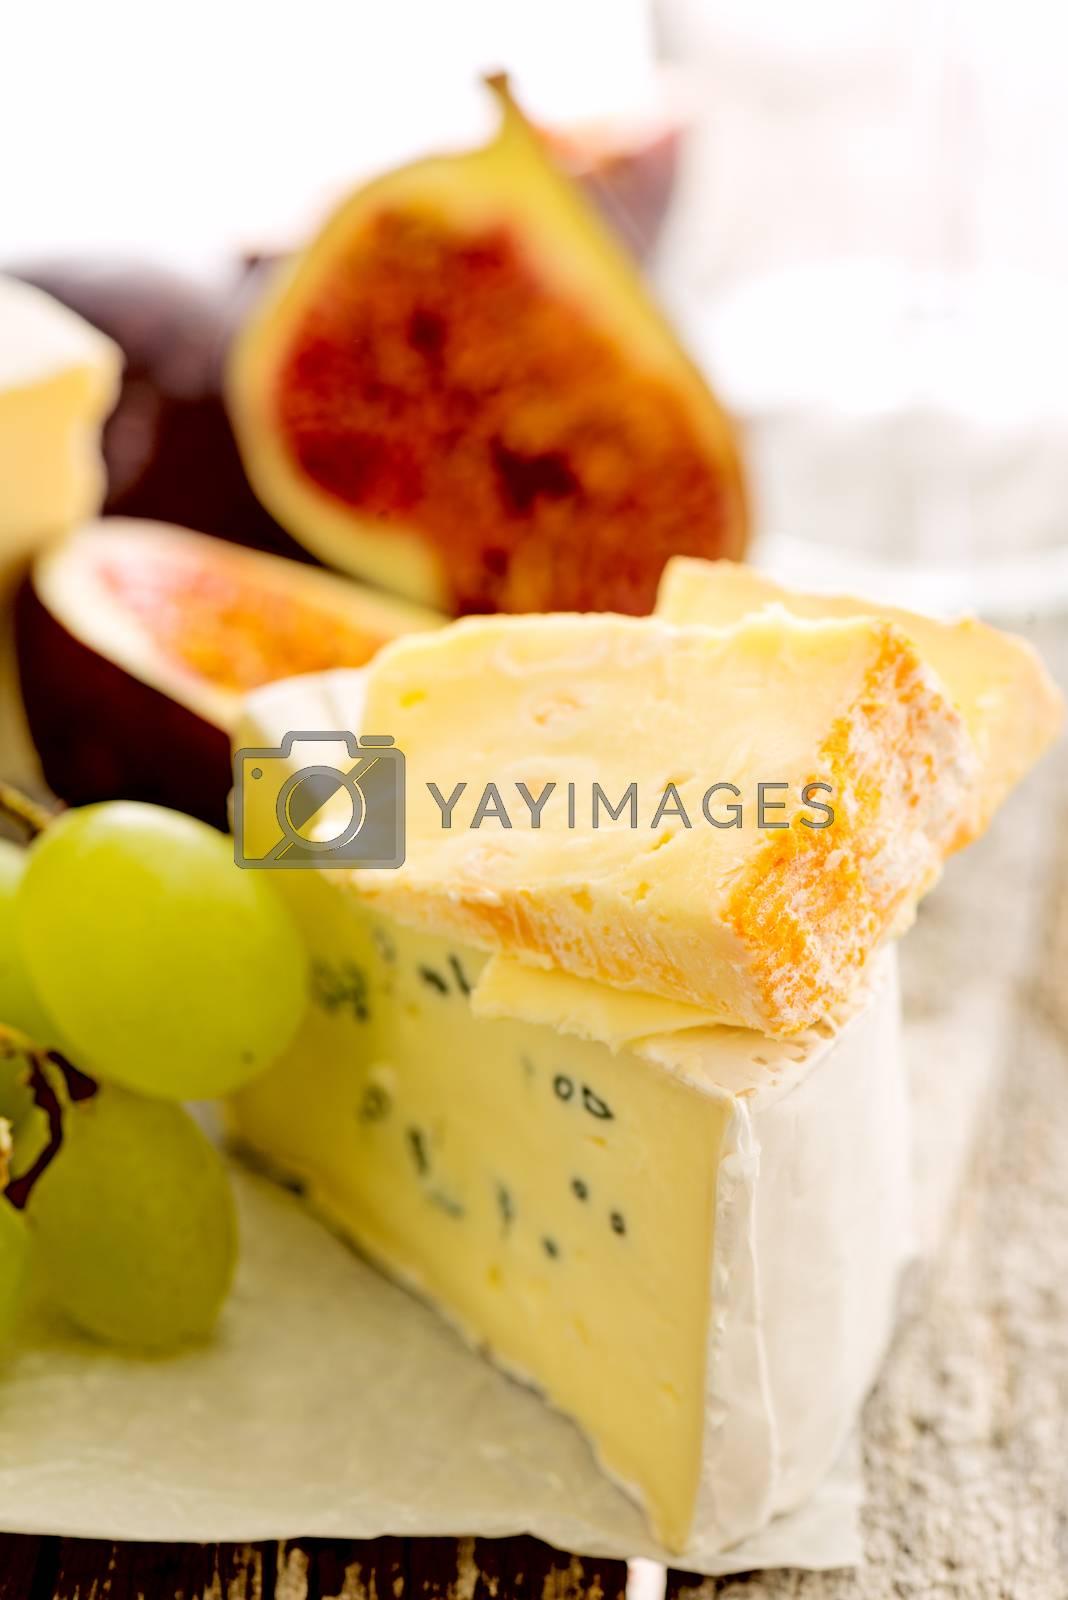 Cheese figs grapes by Nanisimova